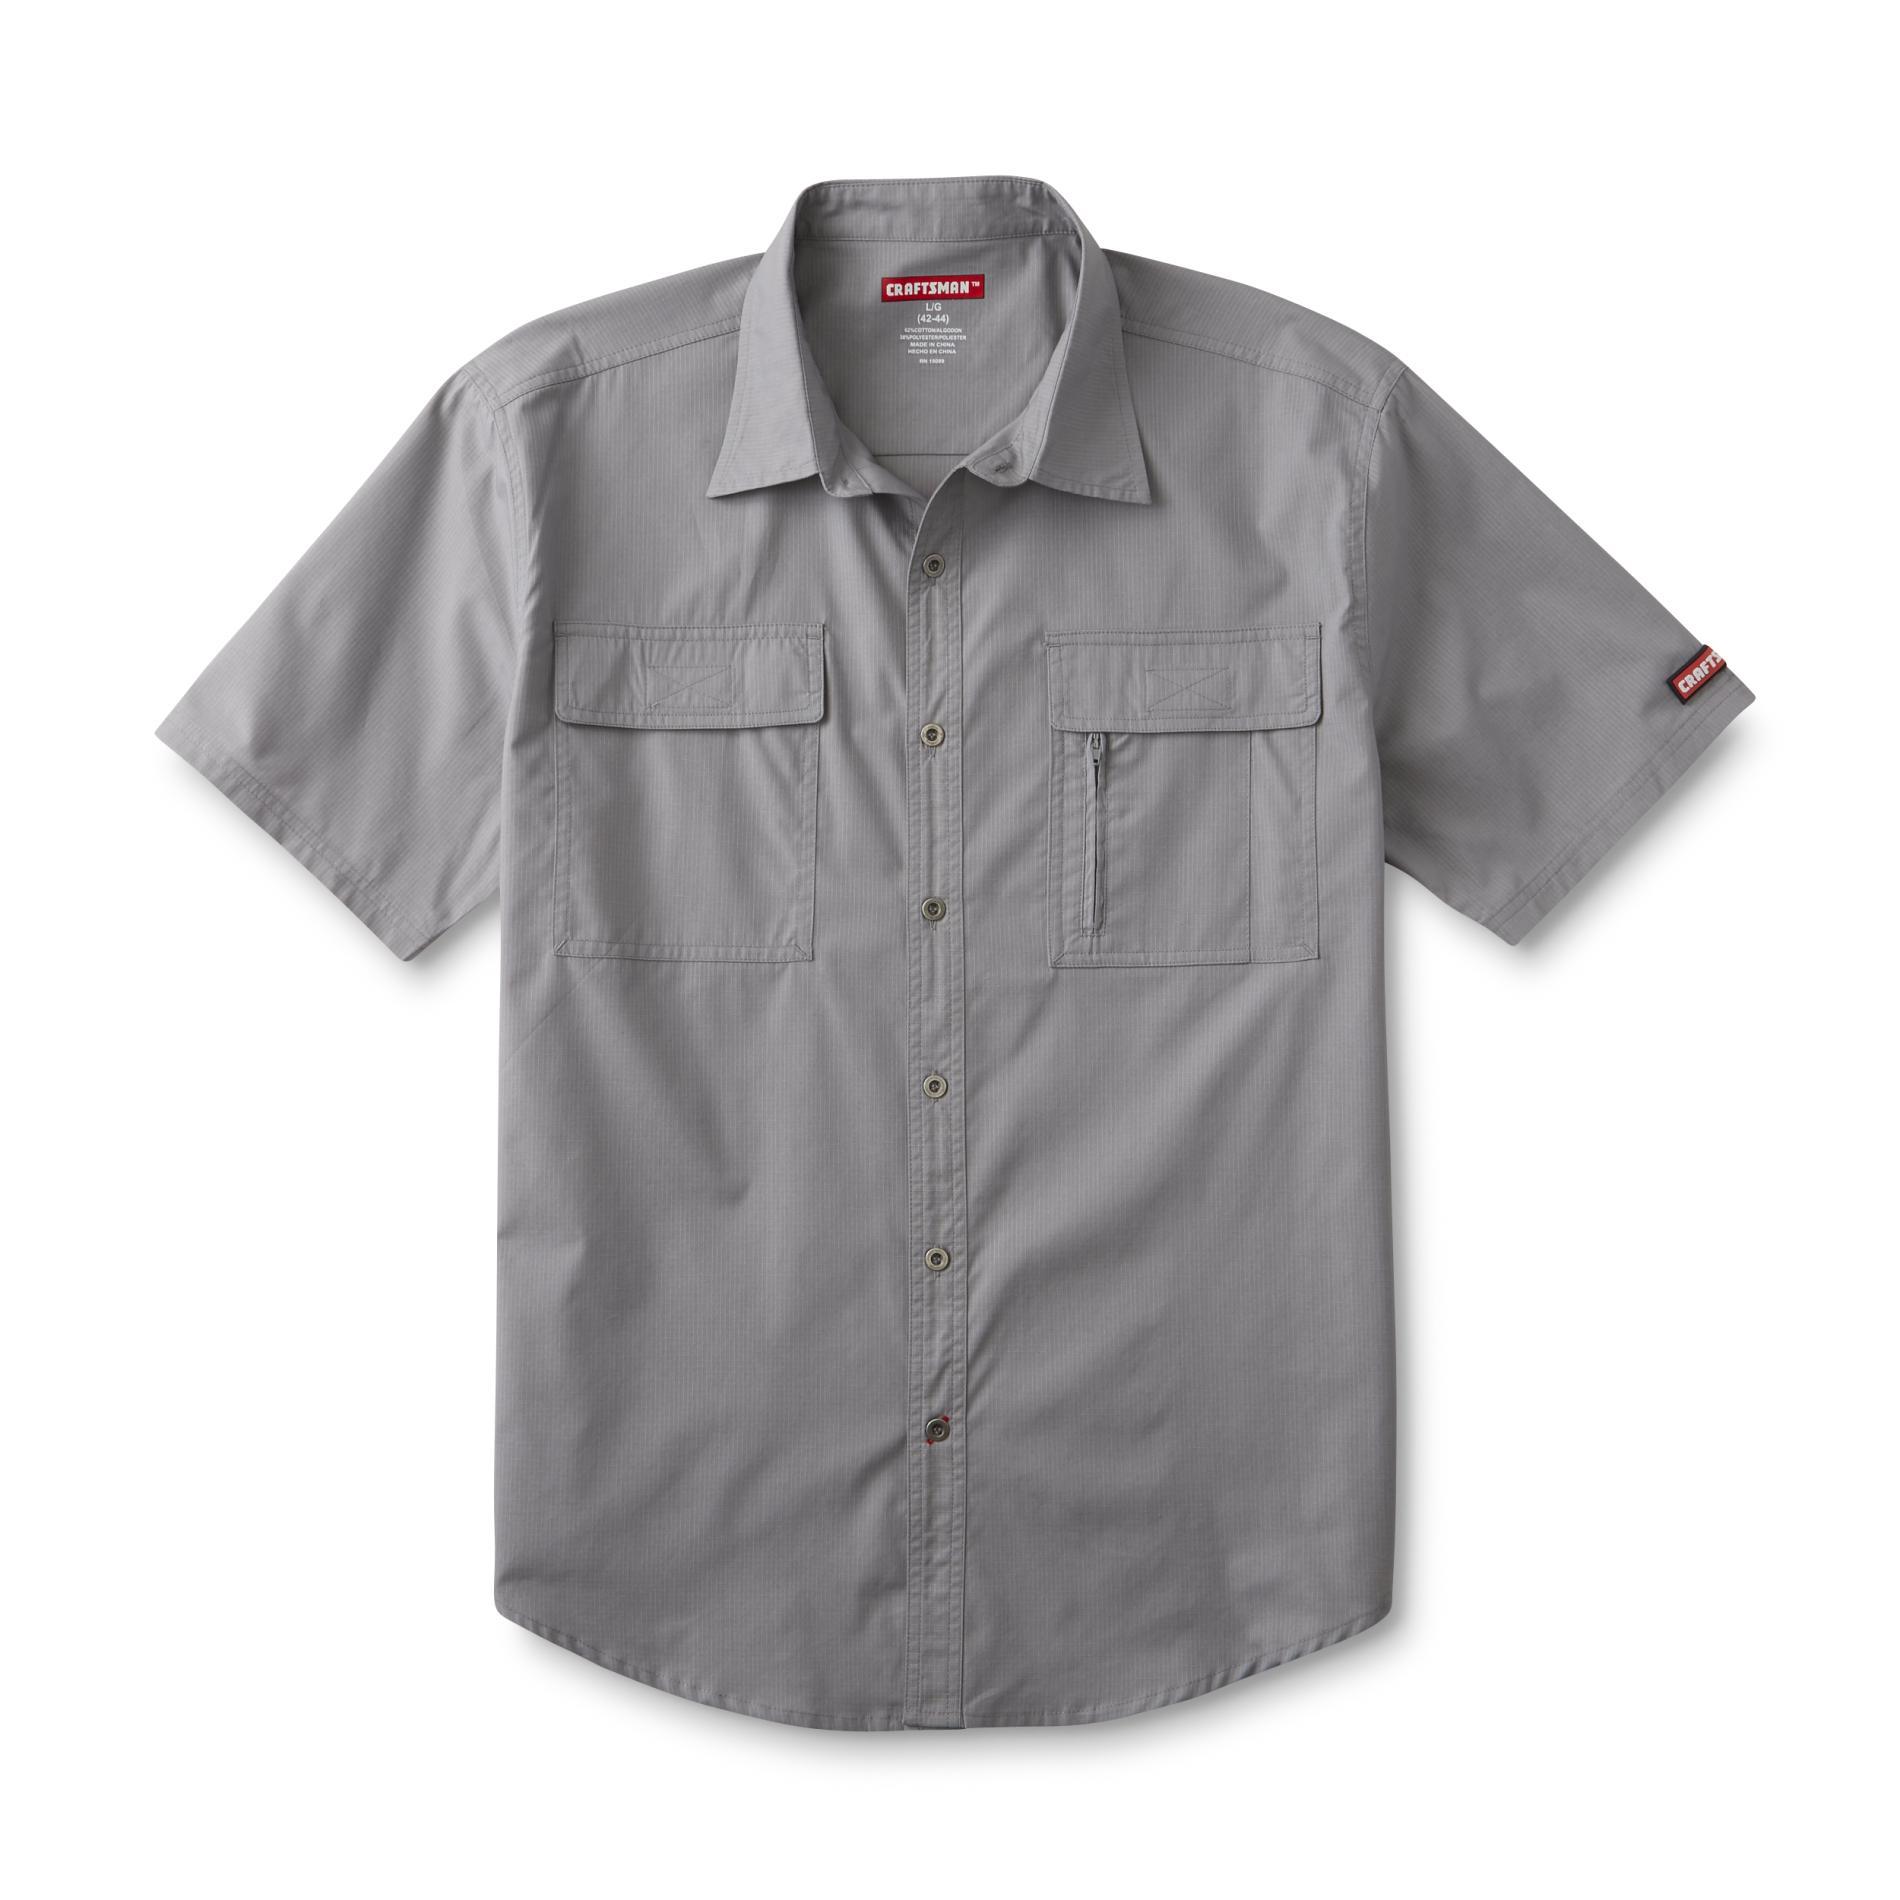 Craftsman Men's Short-Sleeve Work Shirt